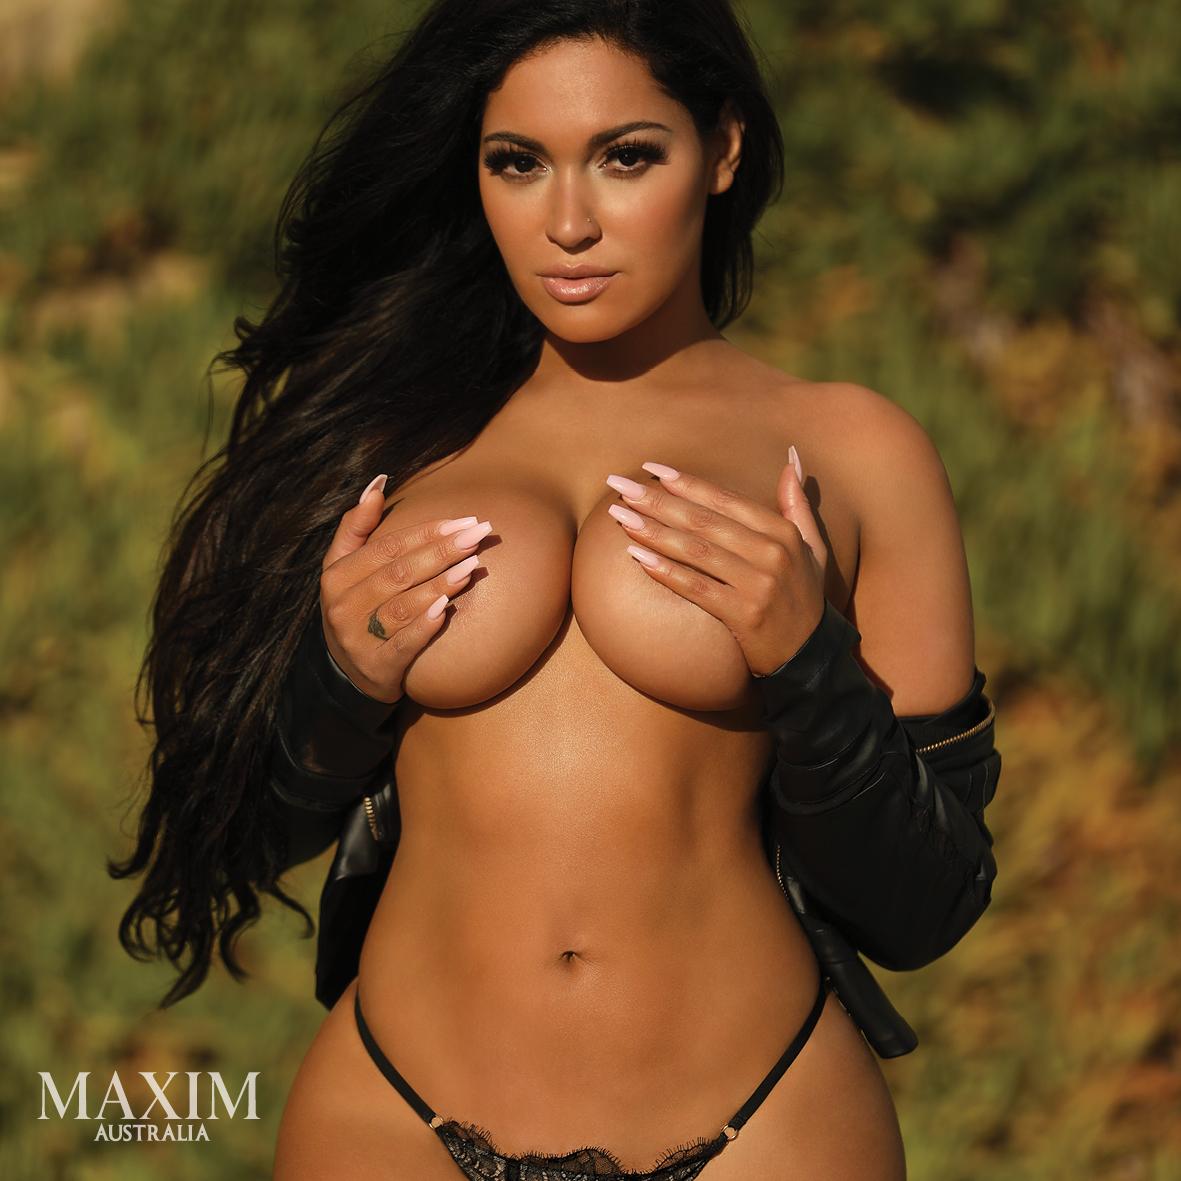 Maxim-Australia-Eliana-Brasil-4